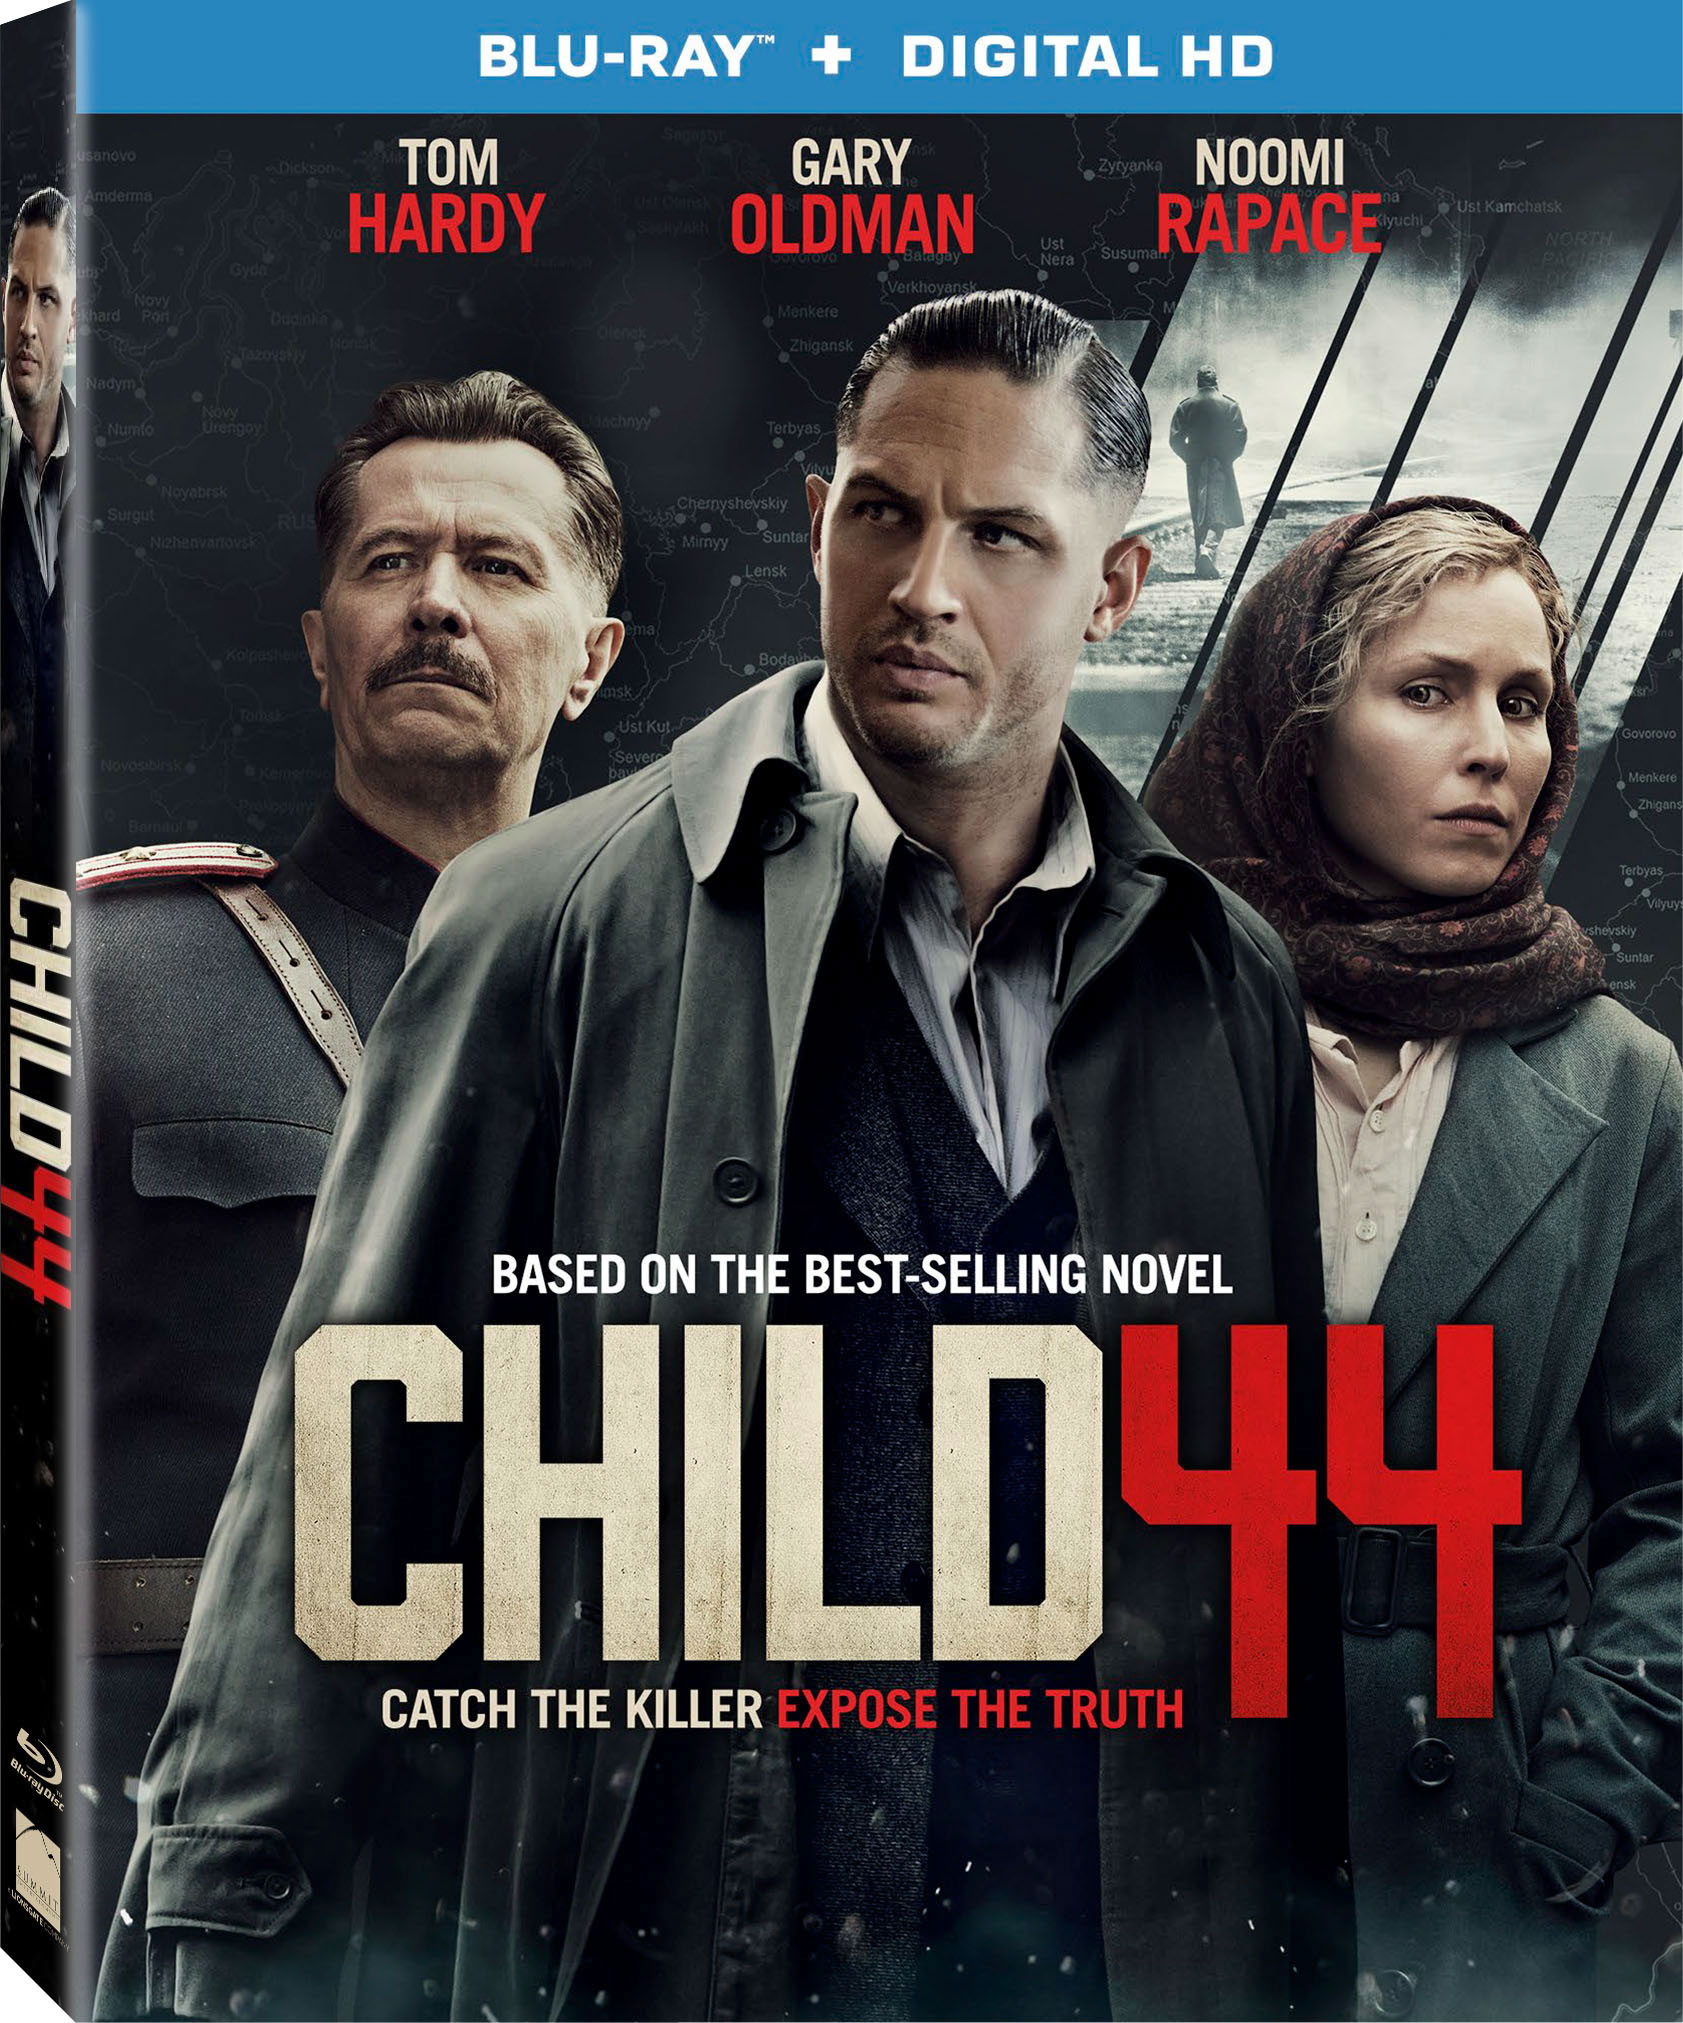 Child 44 Blu-ray